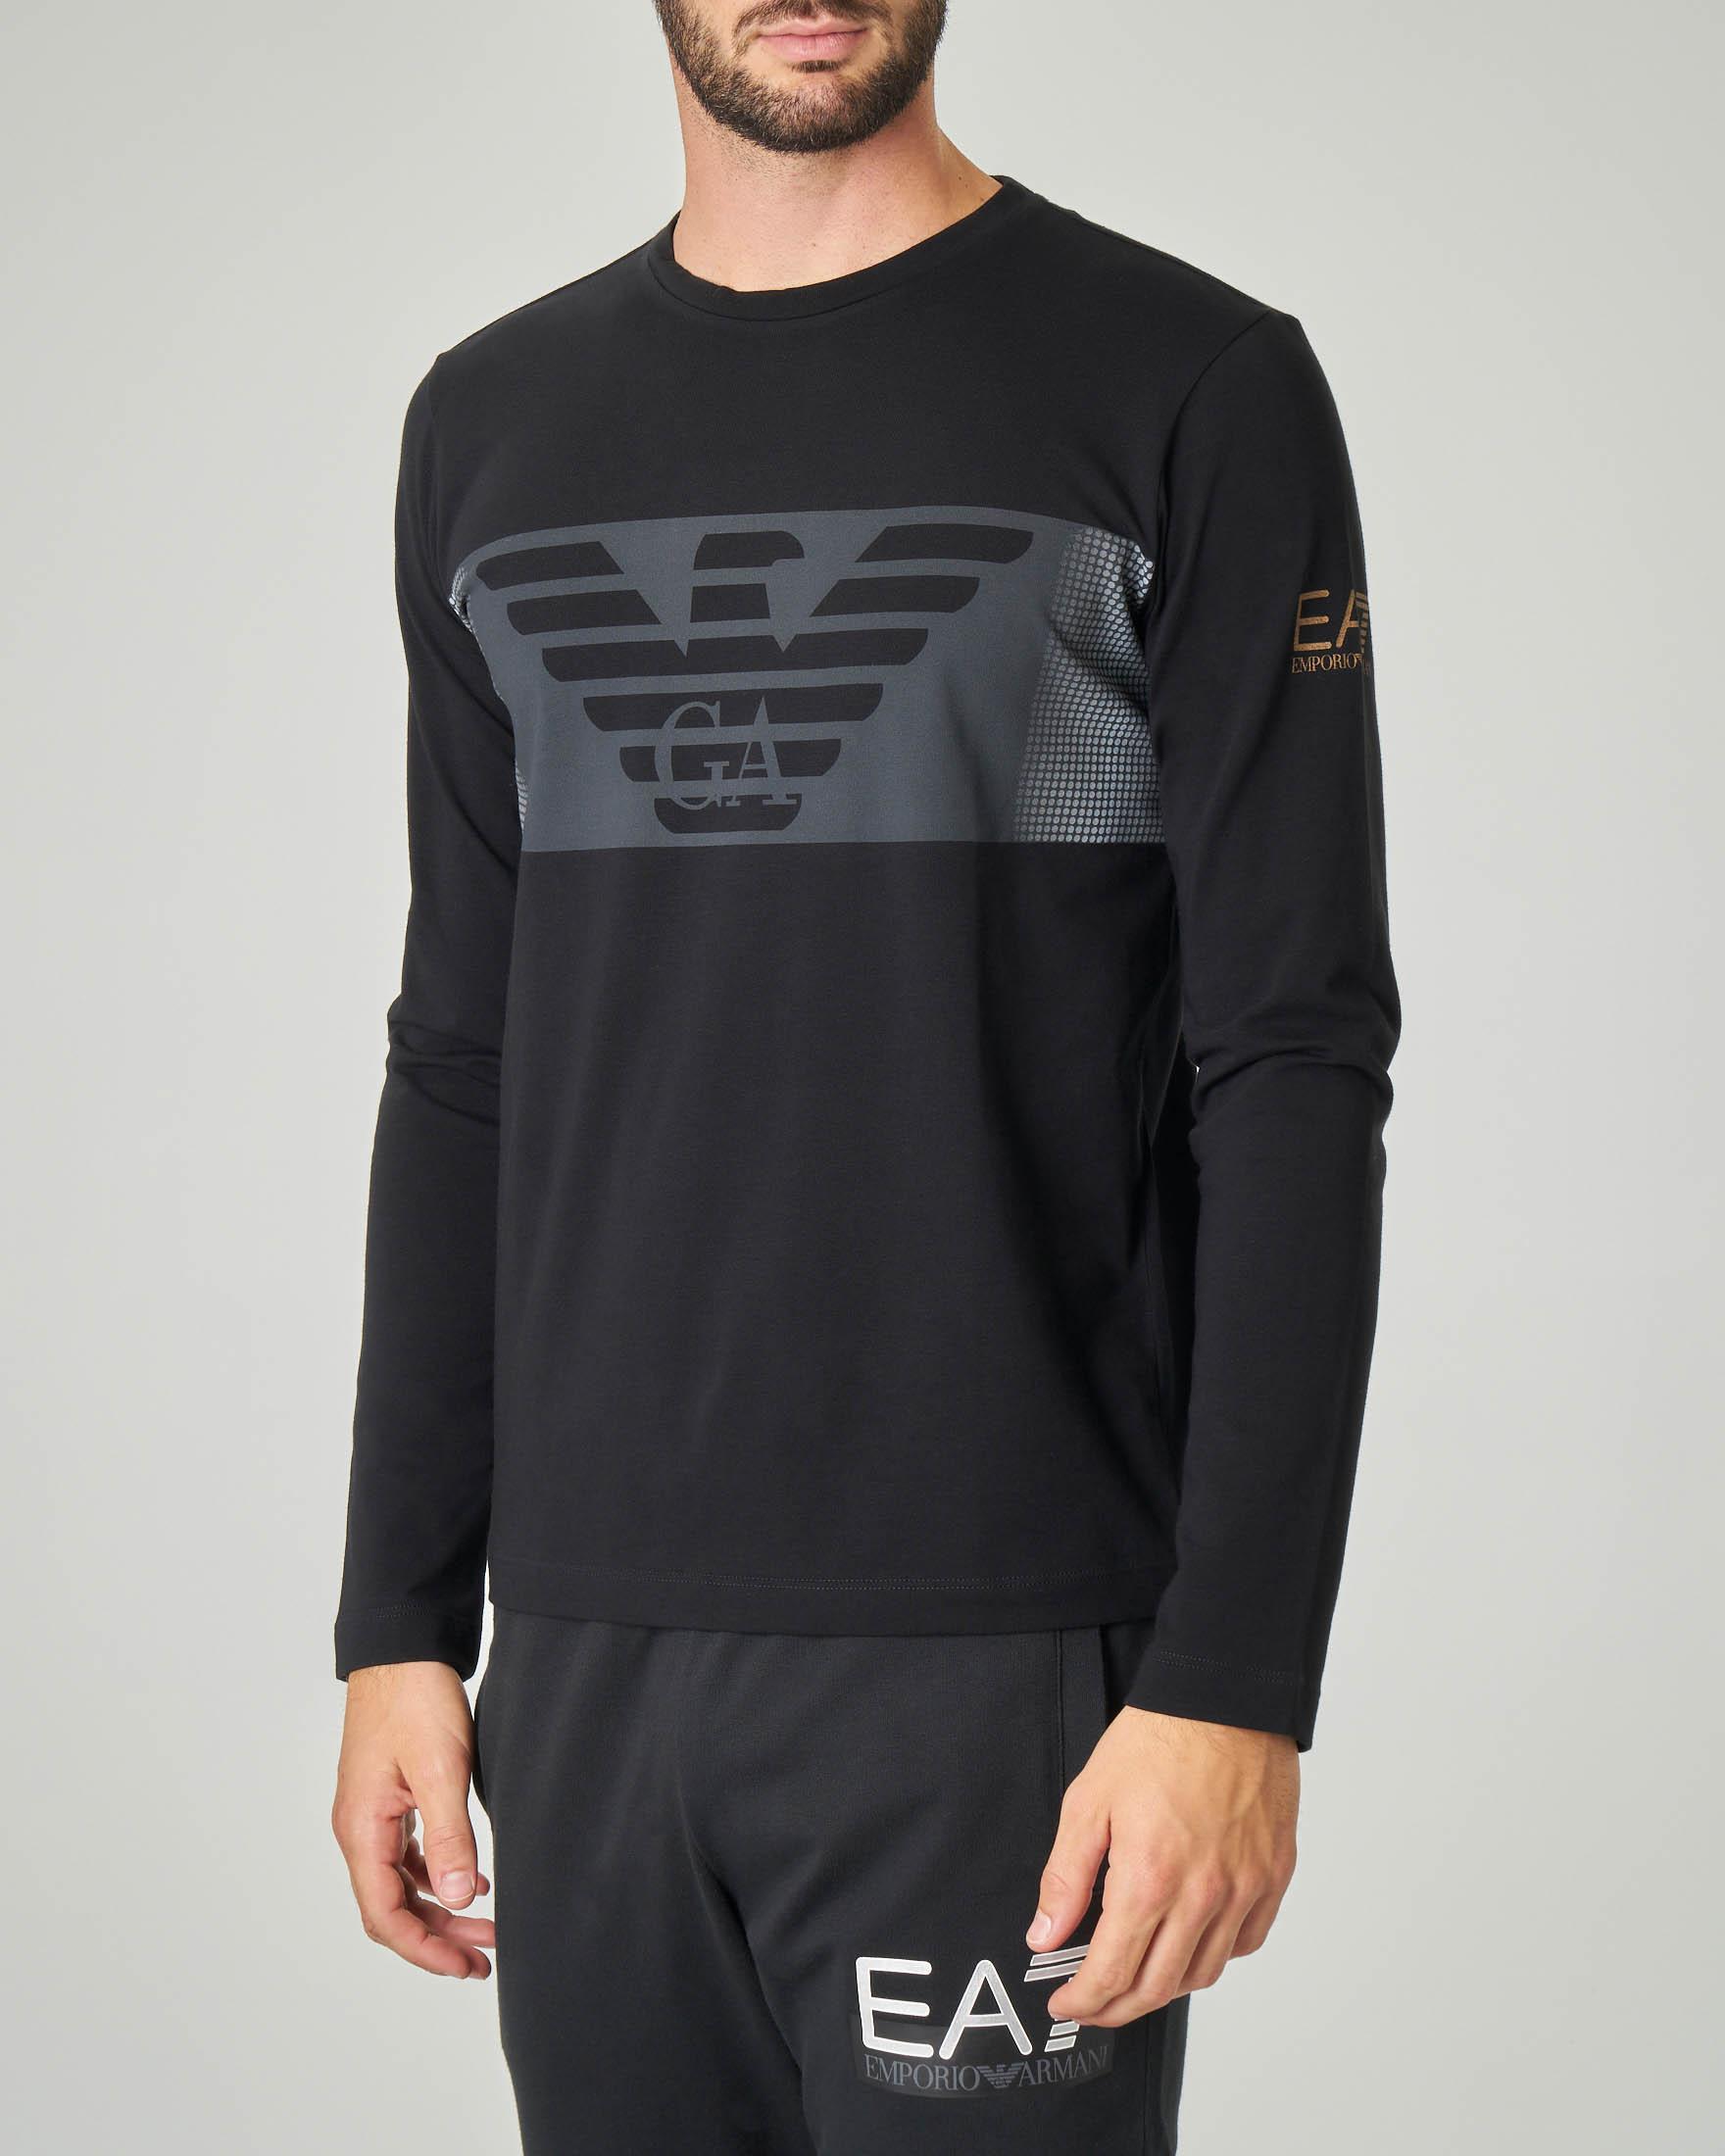 T-shirt nera manica lunga in cotone stretch con logo aquila